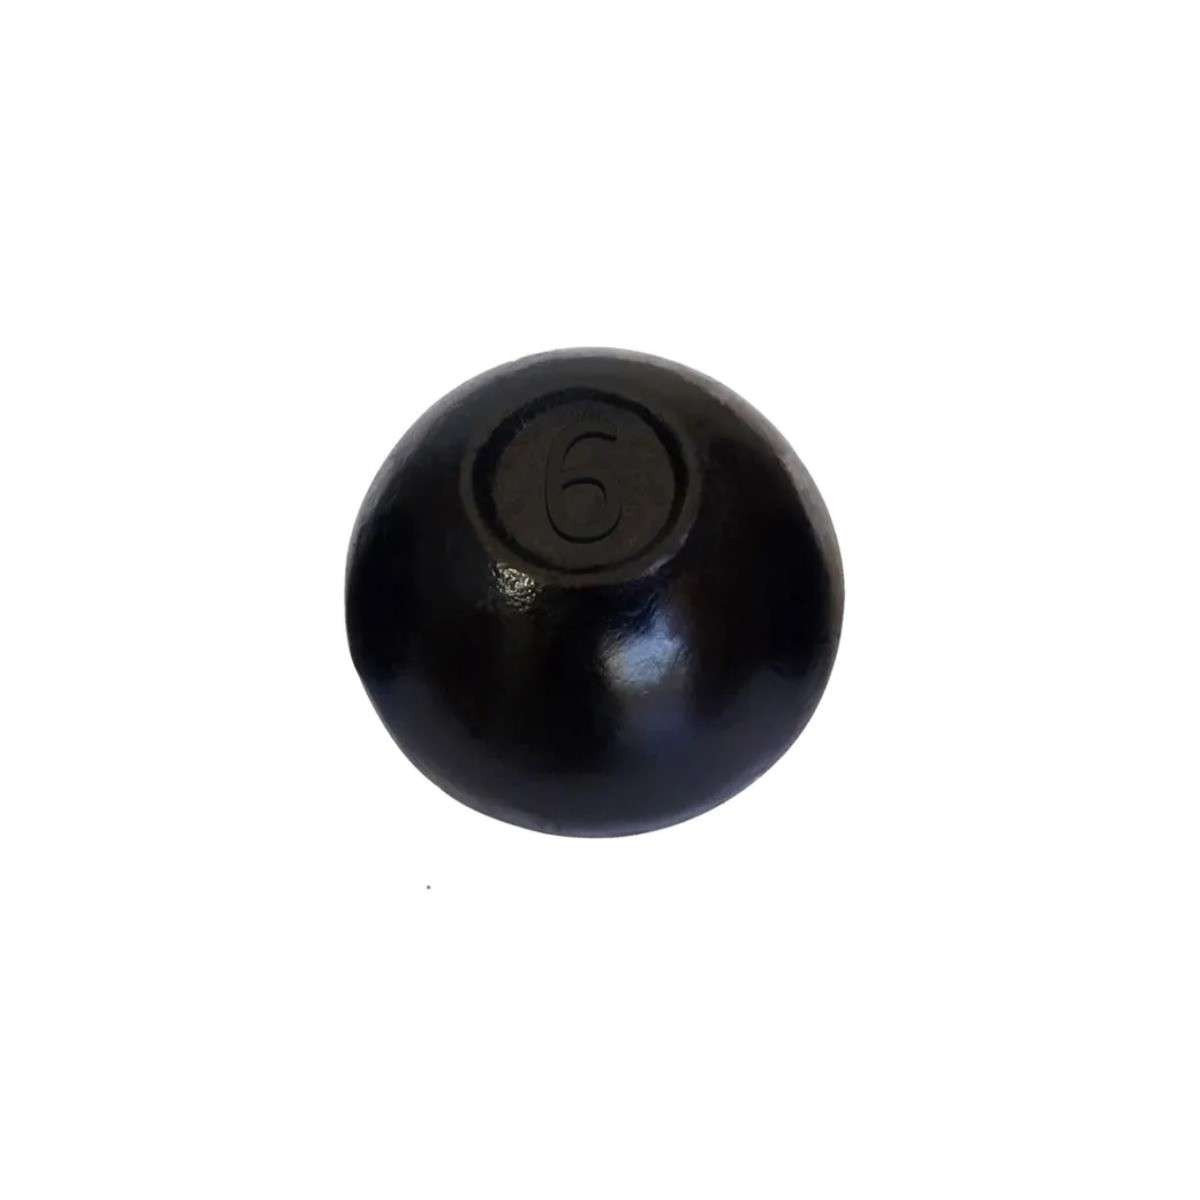 Bola de Arremesso Ferro Fundido Treinamento Funcional 6Kg  - Panela de Ferro Fundido